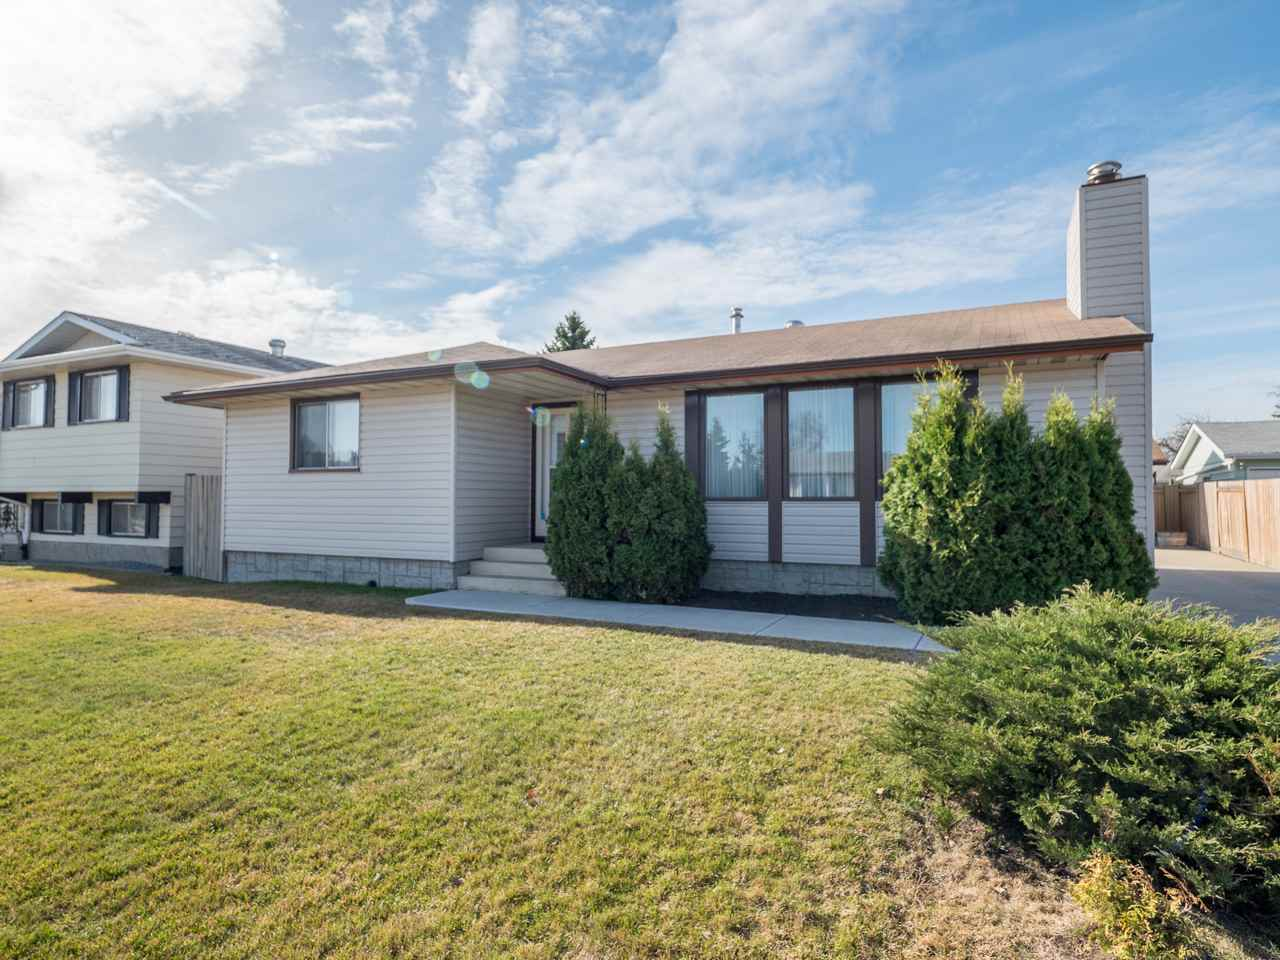 For Sale: 4127 132a Avenue, Edmonton, AB | 3 Bed, 2 Bath House for $339,900. See 30 photos!